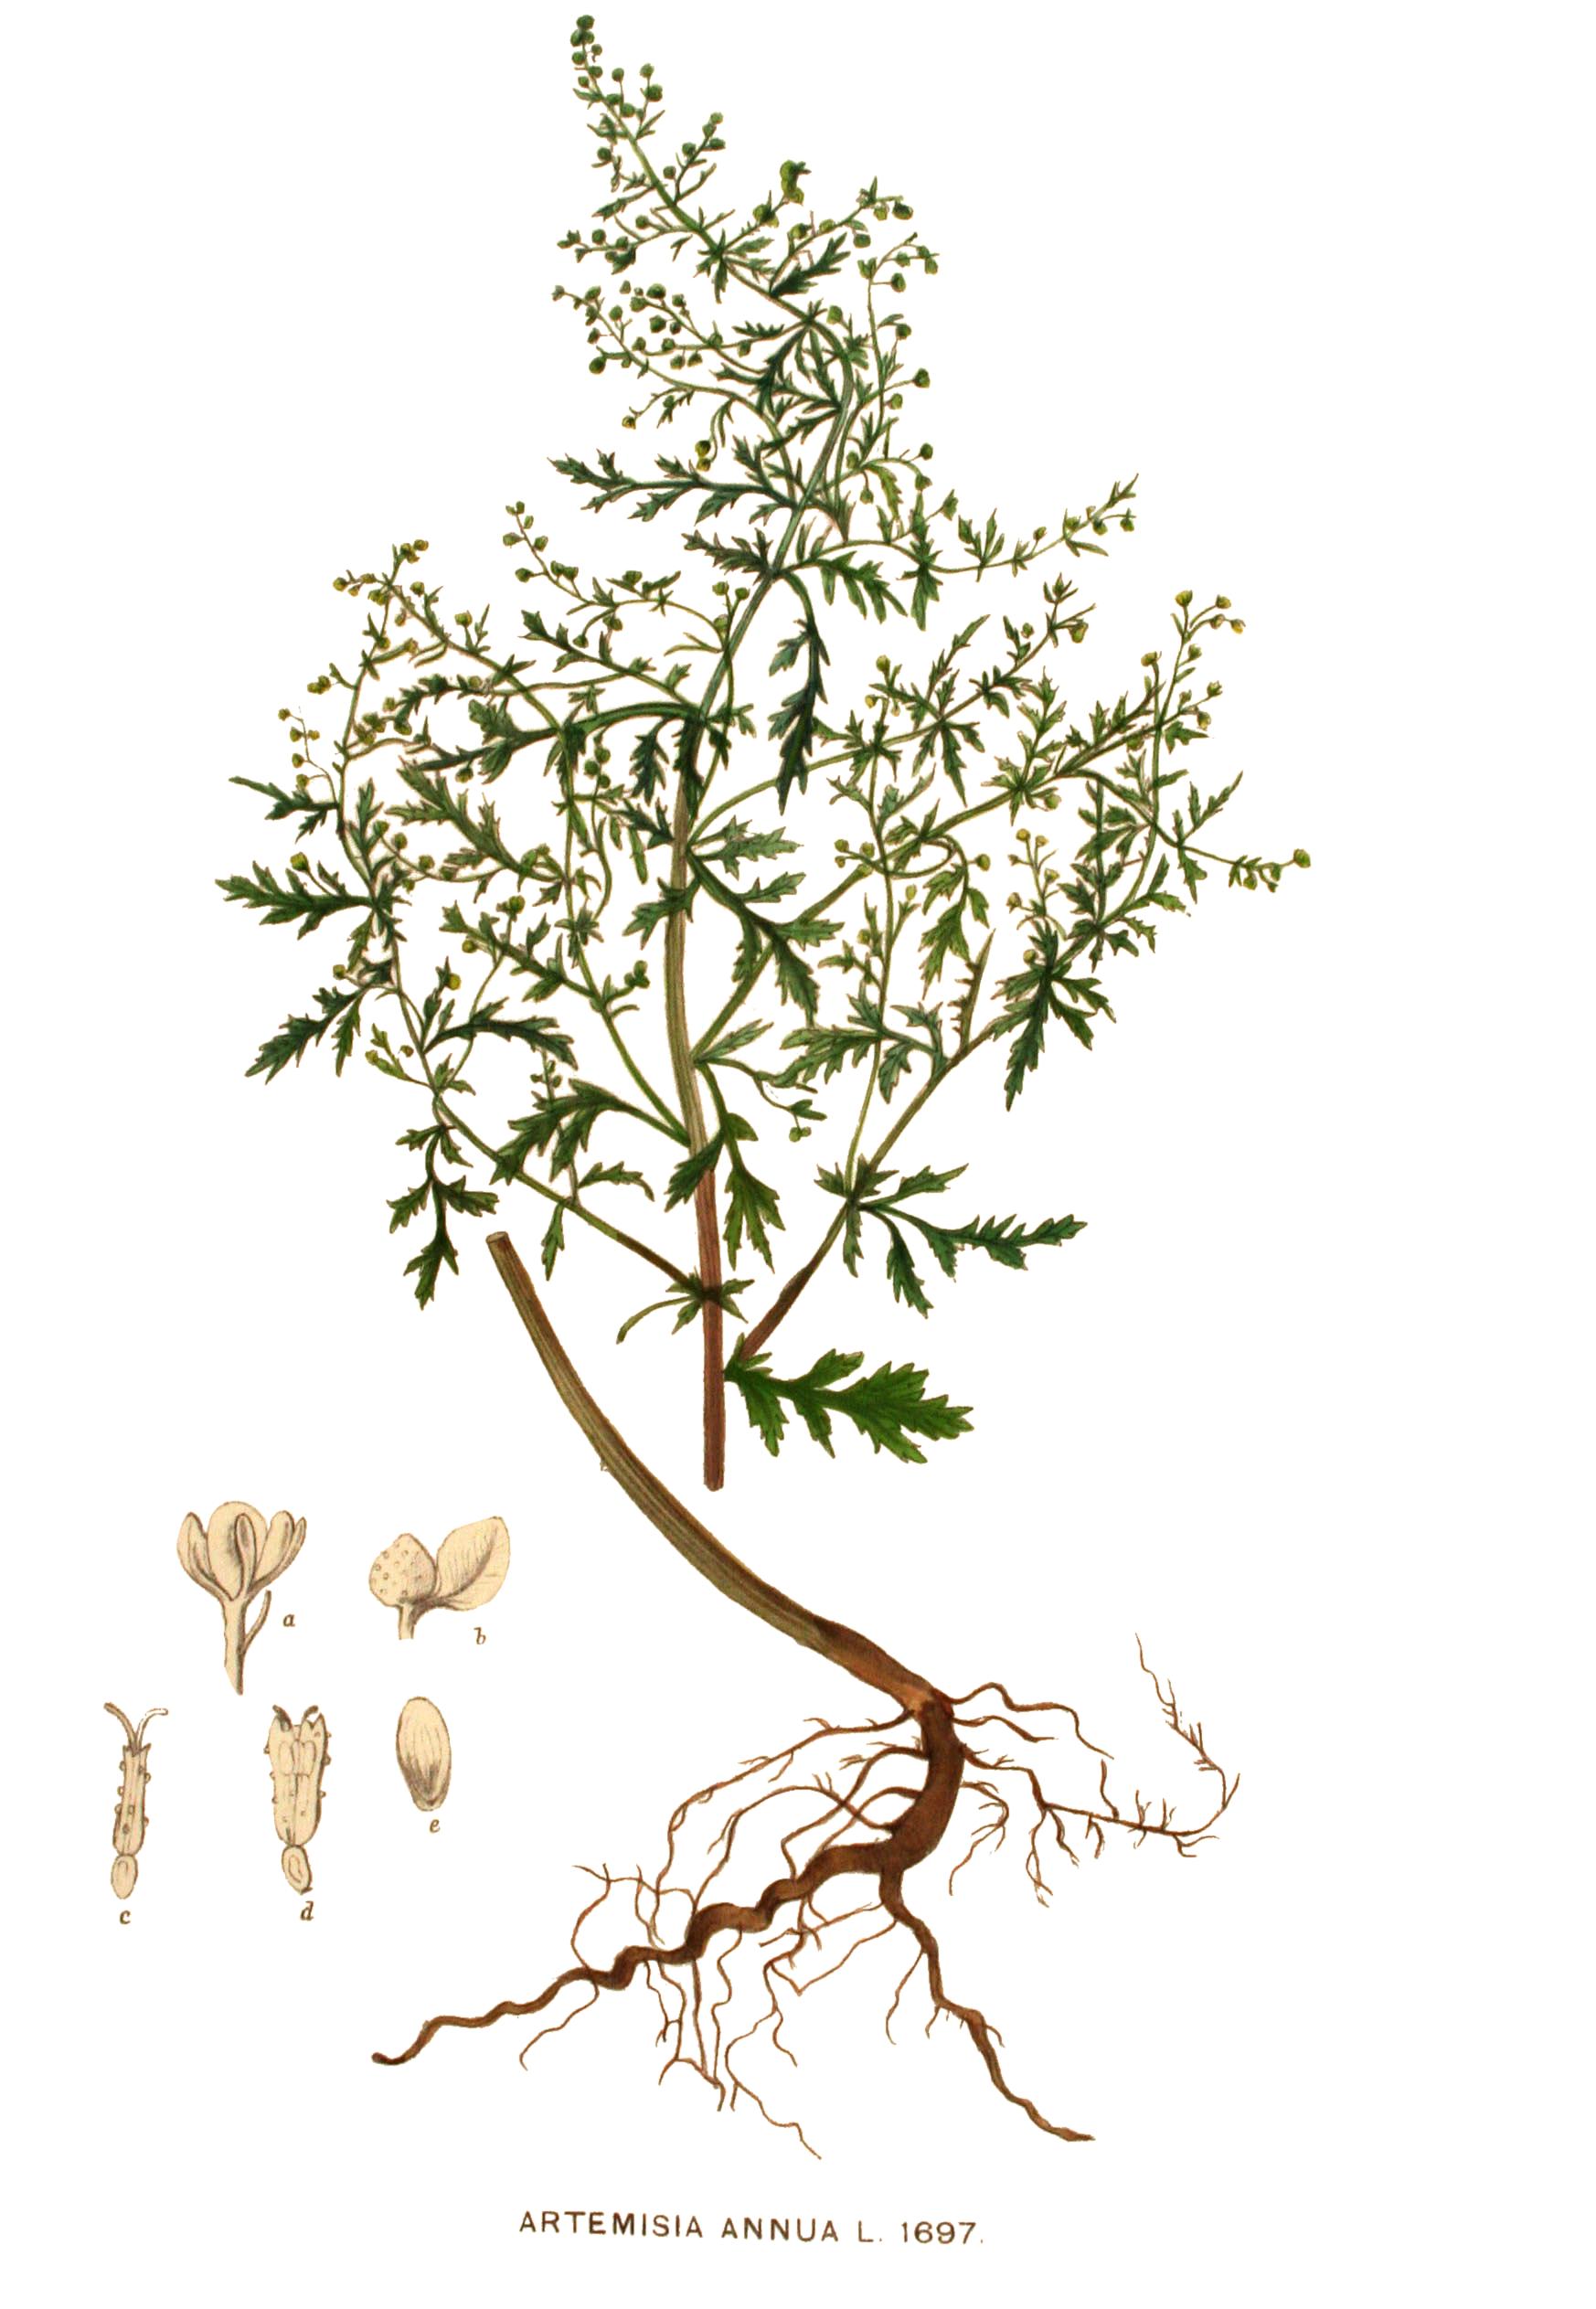 File:Artemisia annua - 001x.jpg - Wikimedia Commons